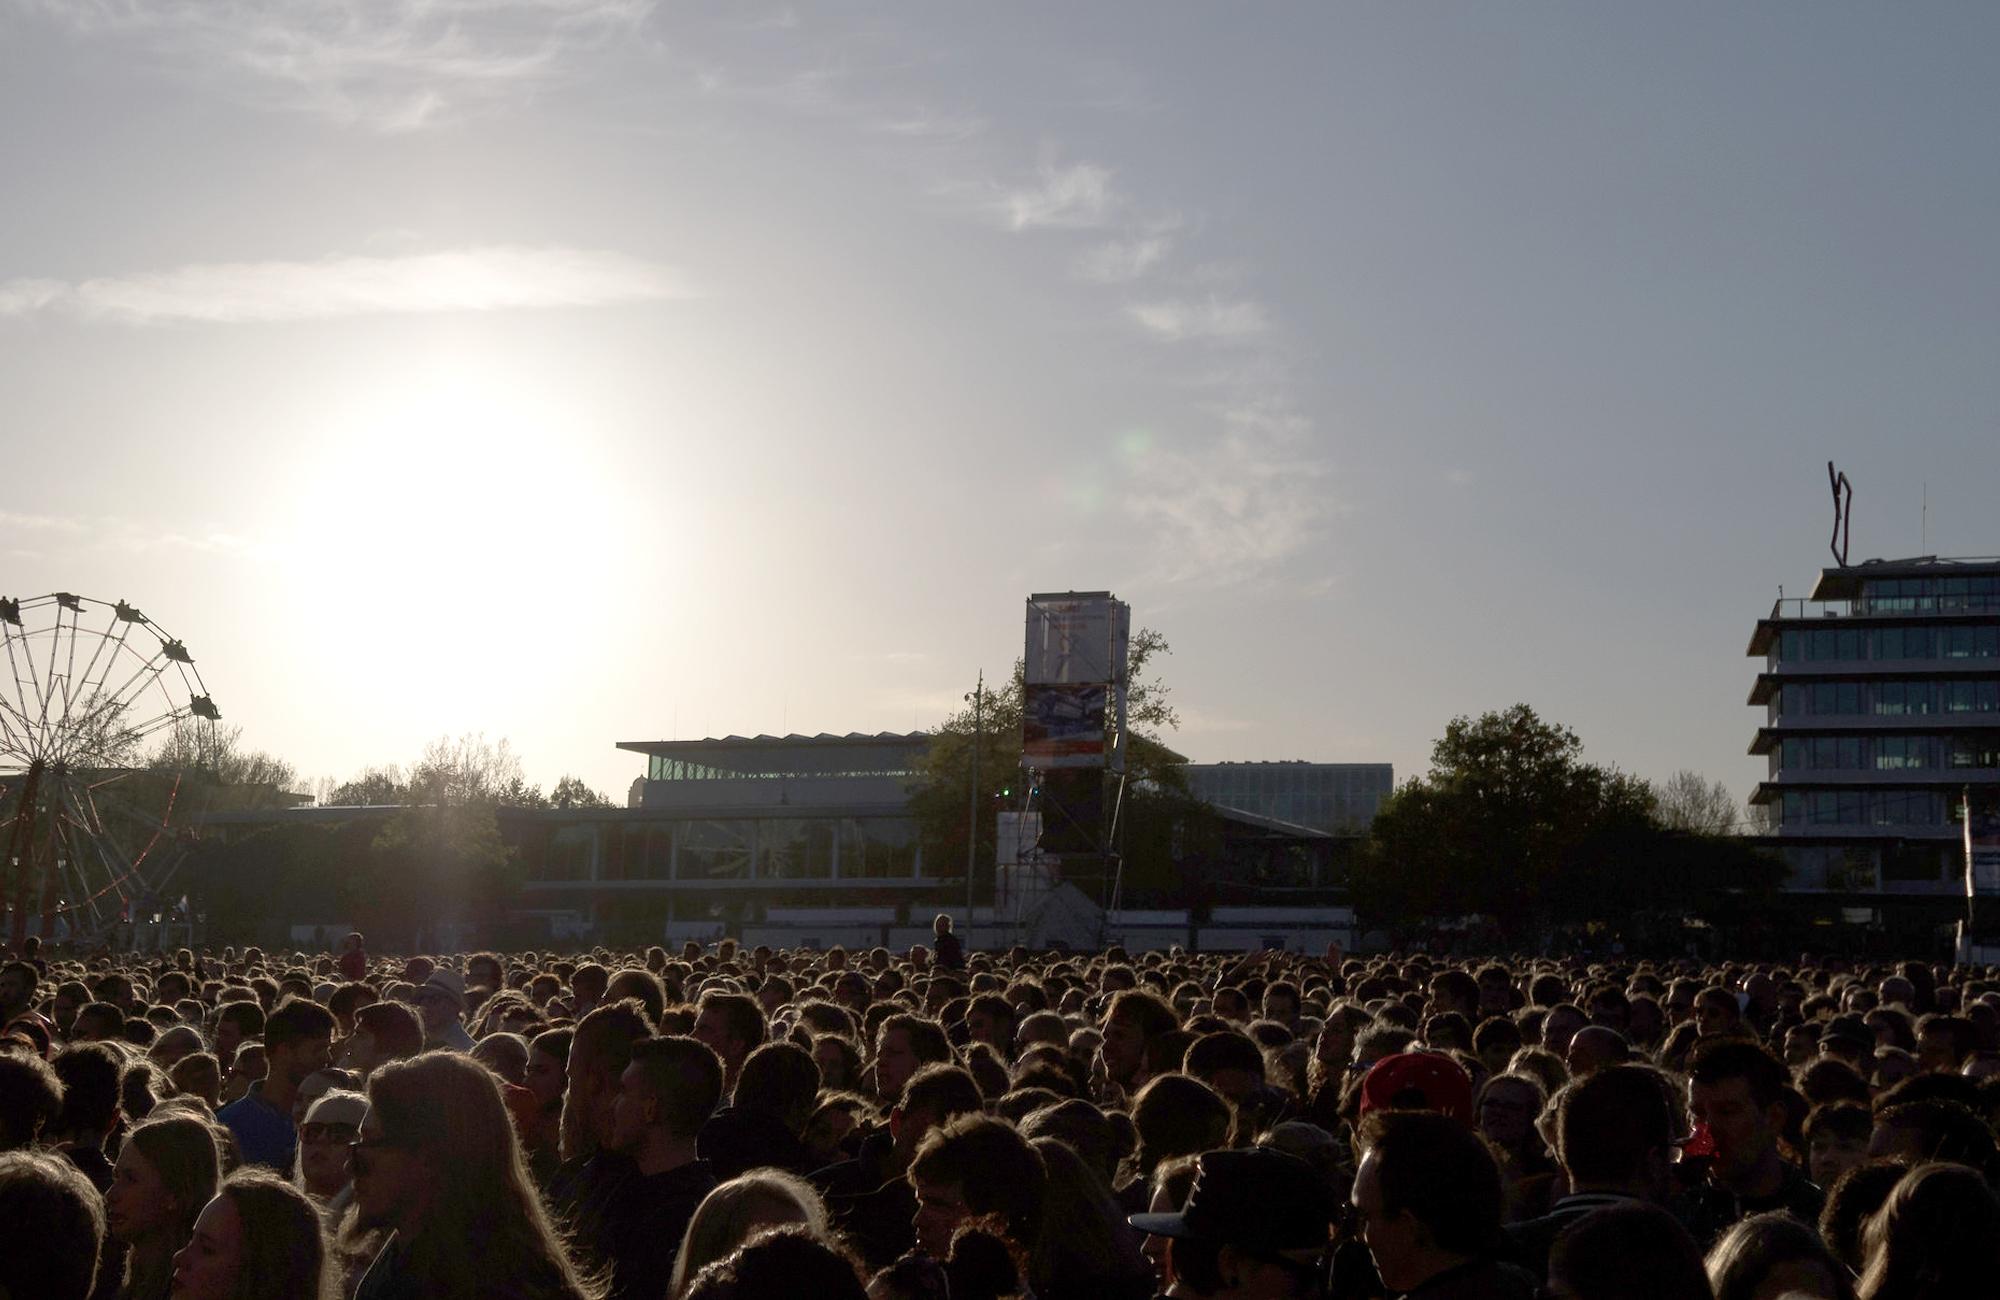 Bevrijdingsfestival Overijssel Zwolle